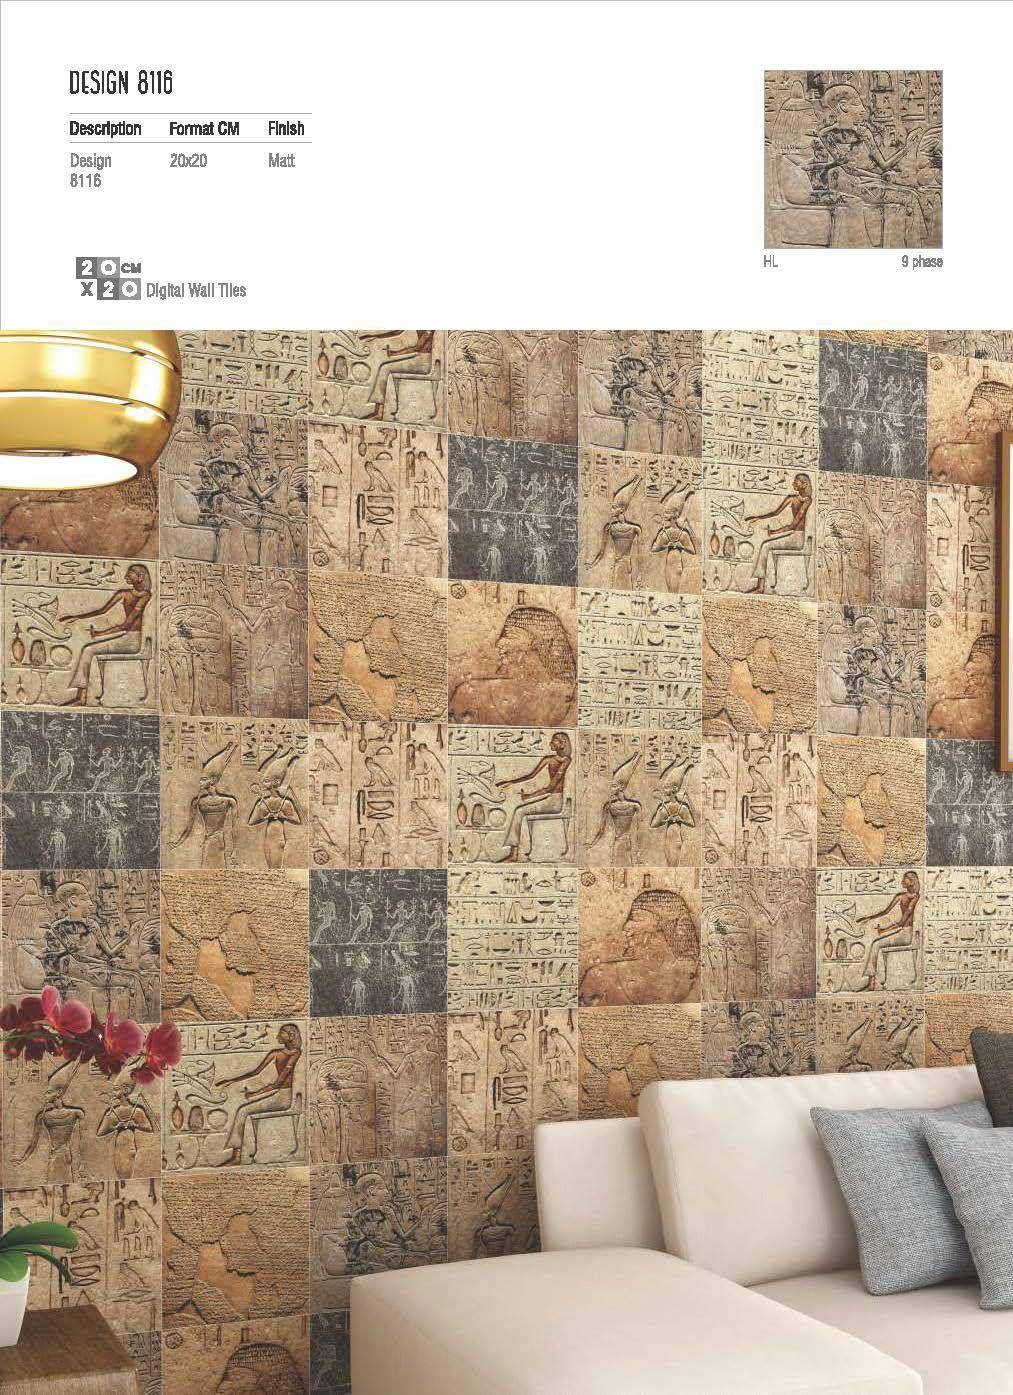 Egyptian design 8116 matt finish millennium tiles 200x200mm 8x8 egyptian design 8116 matt finish millennium tiles 200x200mm 8x8 digital ceramic wall tiles series digital technology for details digital printing dailygadgetfo Gallery